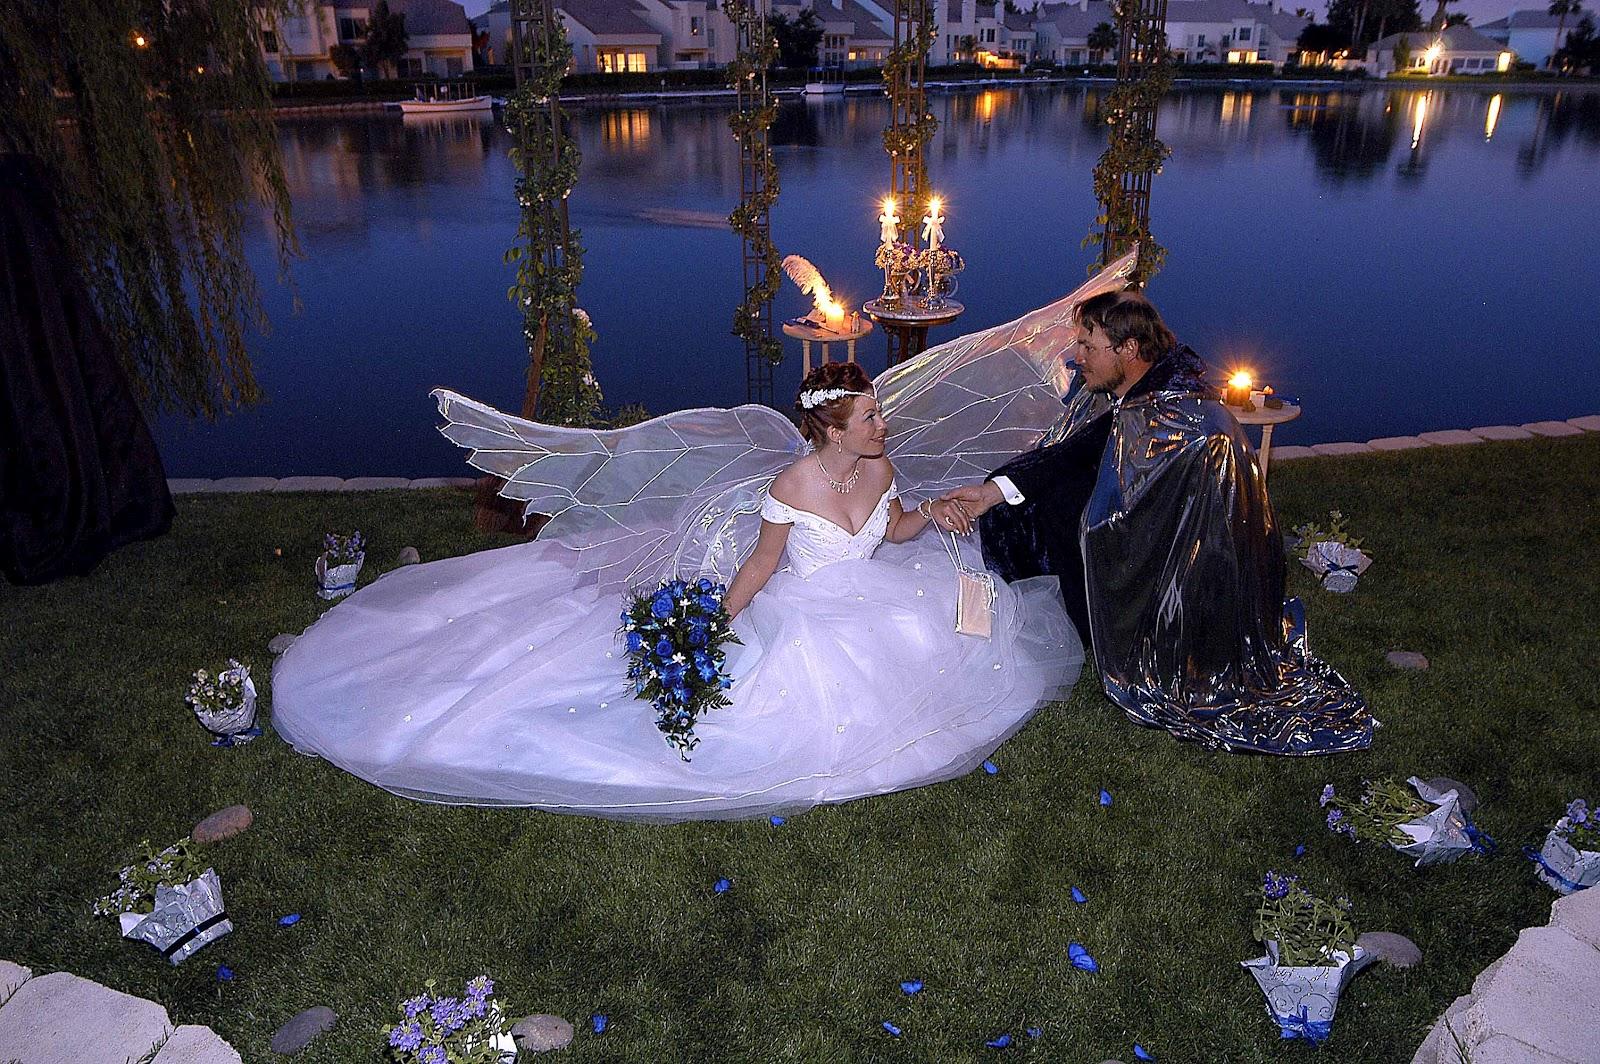 Fairy Tales Wedding Dress Design Picture | Wedding dresses ...